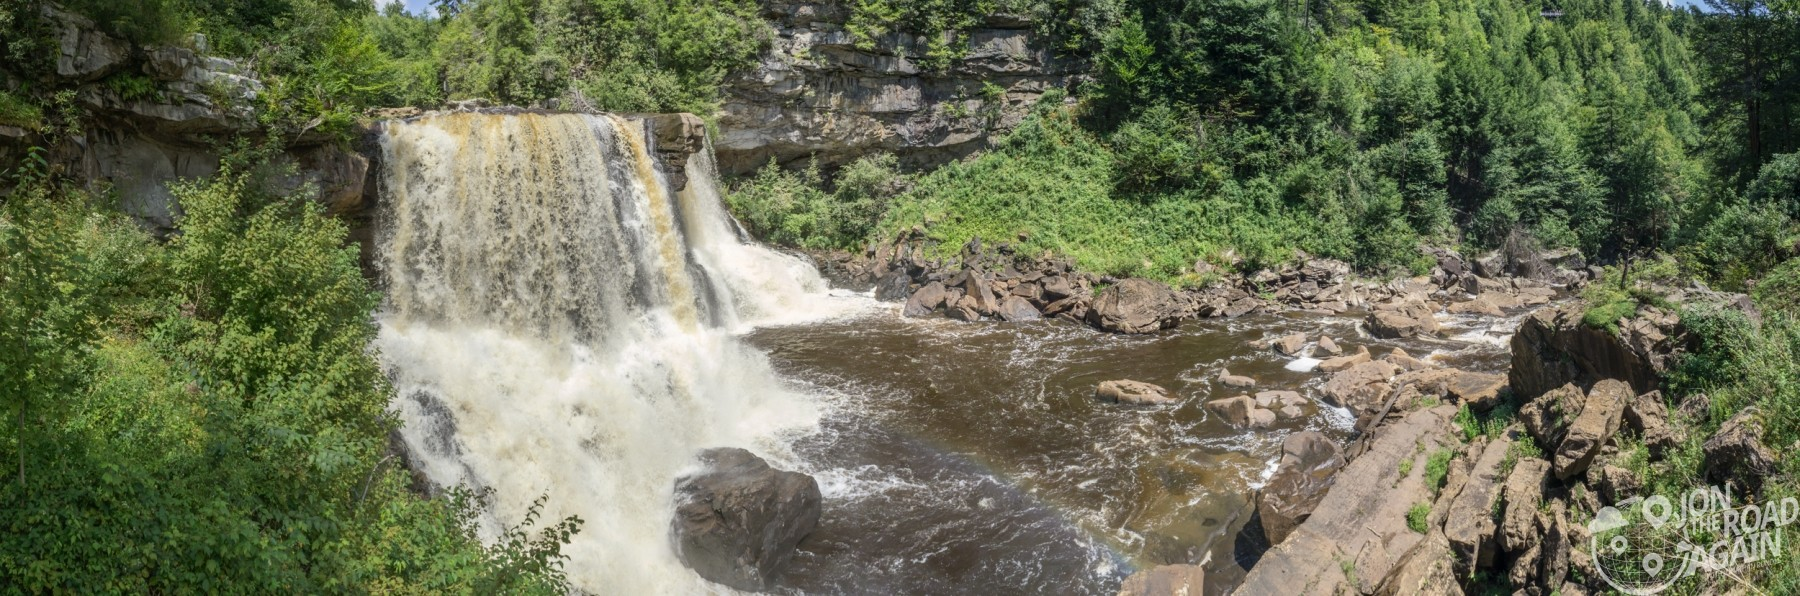 Blackwater Falls Panorama